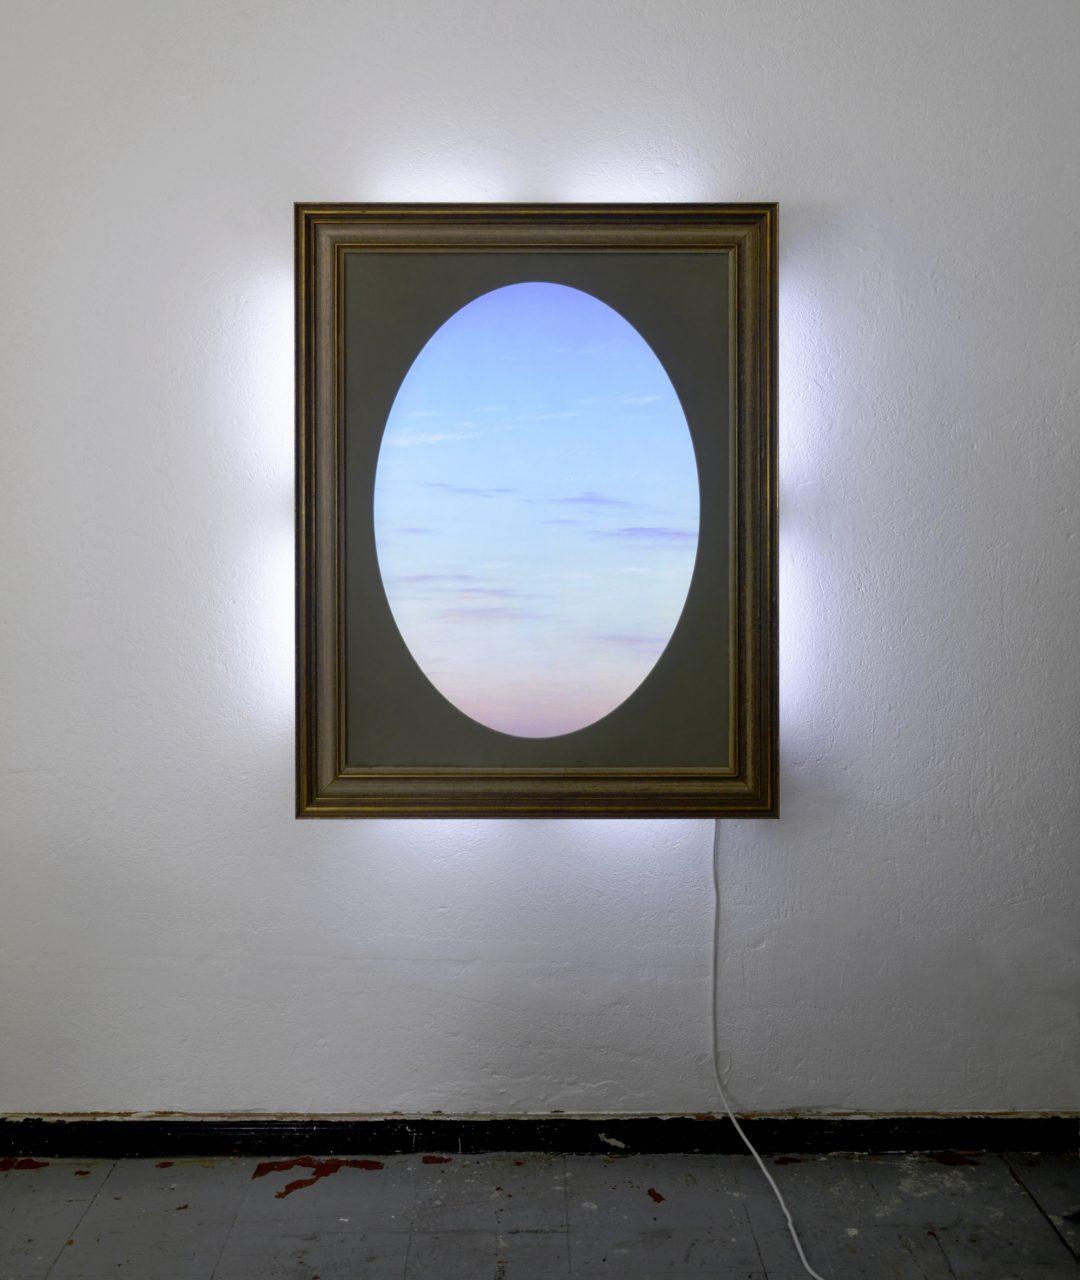 """Bessere Zeiten dämmern"" – ""Better times loom"", 2016, printed foil, glass, cardboard, frame, LEDs, plywood, fly net 92 x 72 x 16 cm"